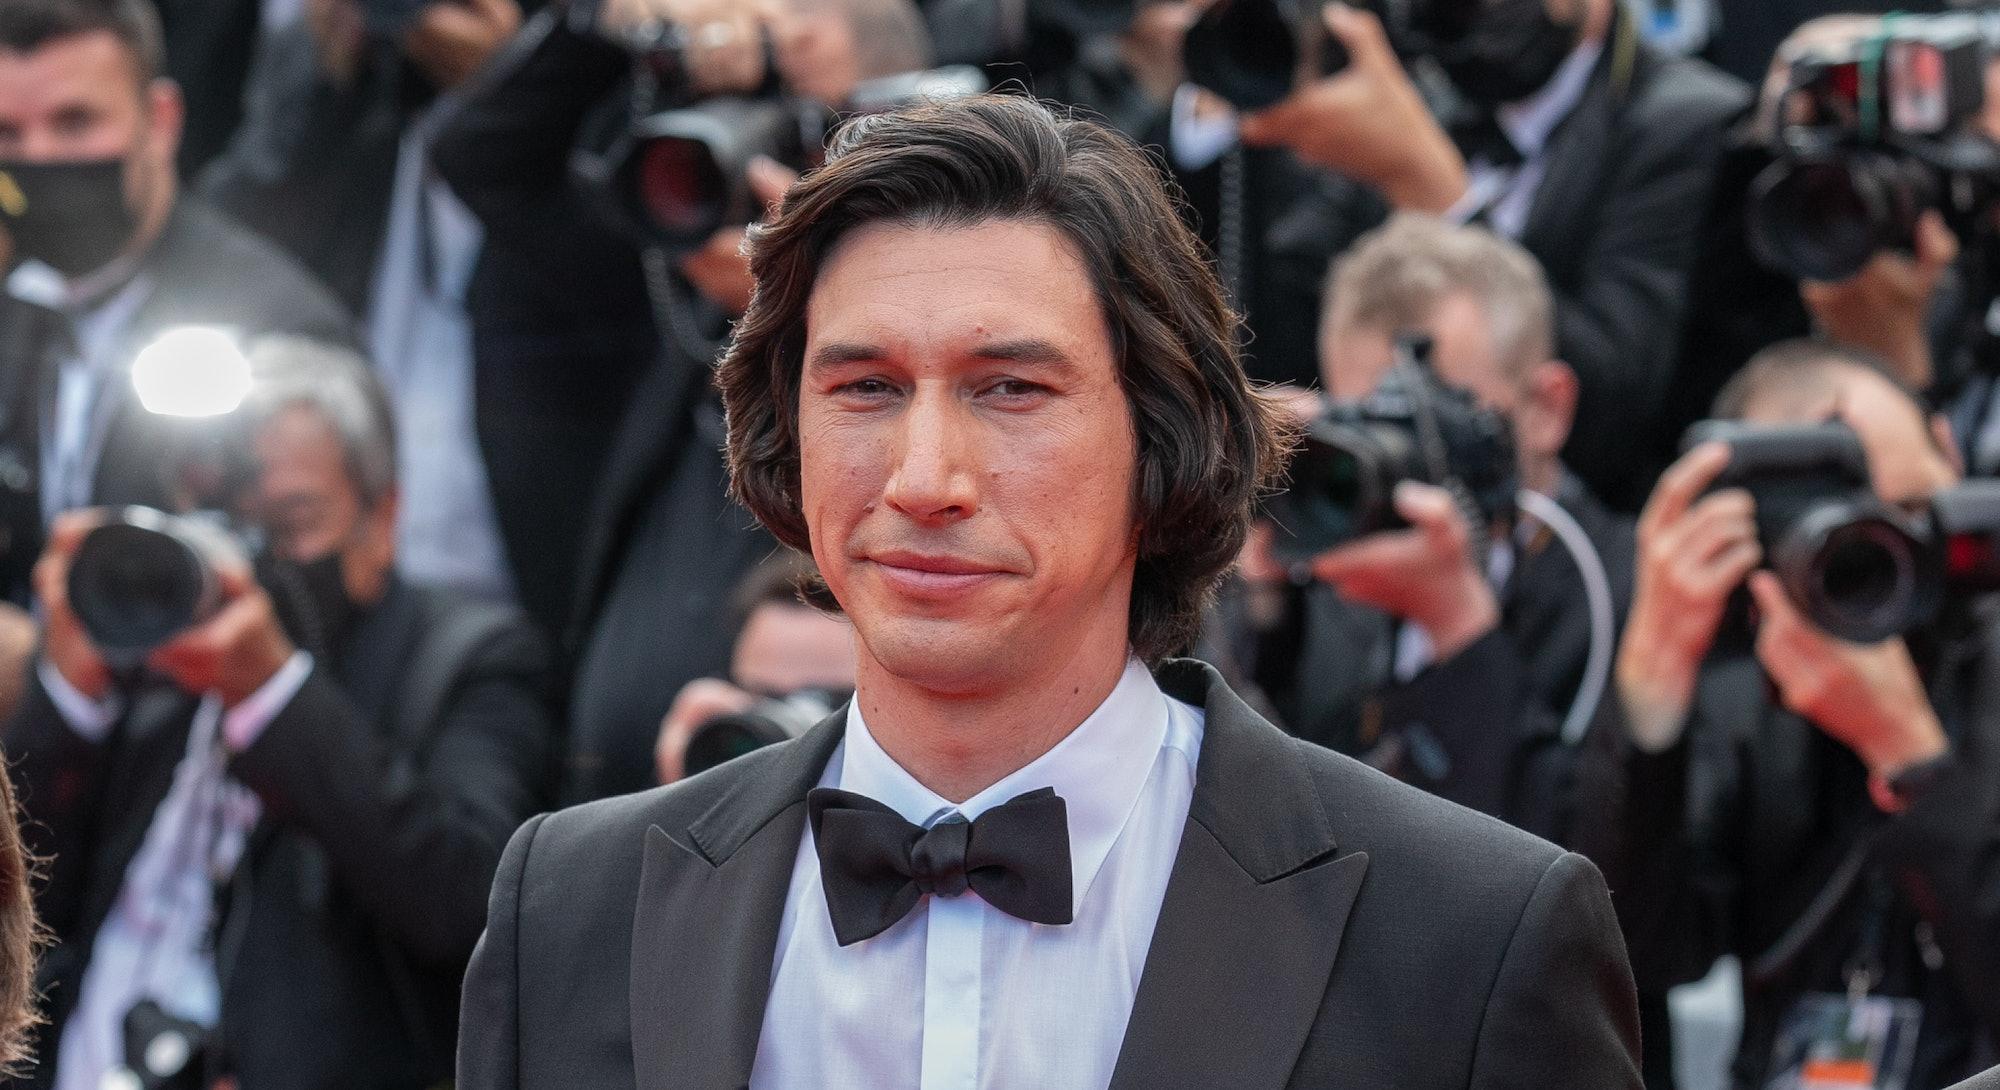 Adam Driver at the 'Annette' Cannes premiere.